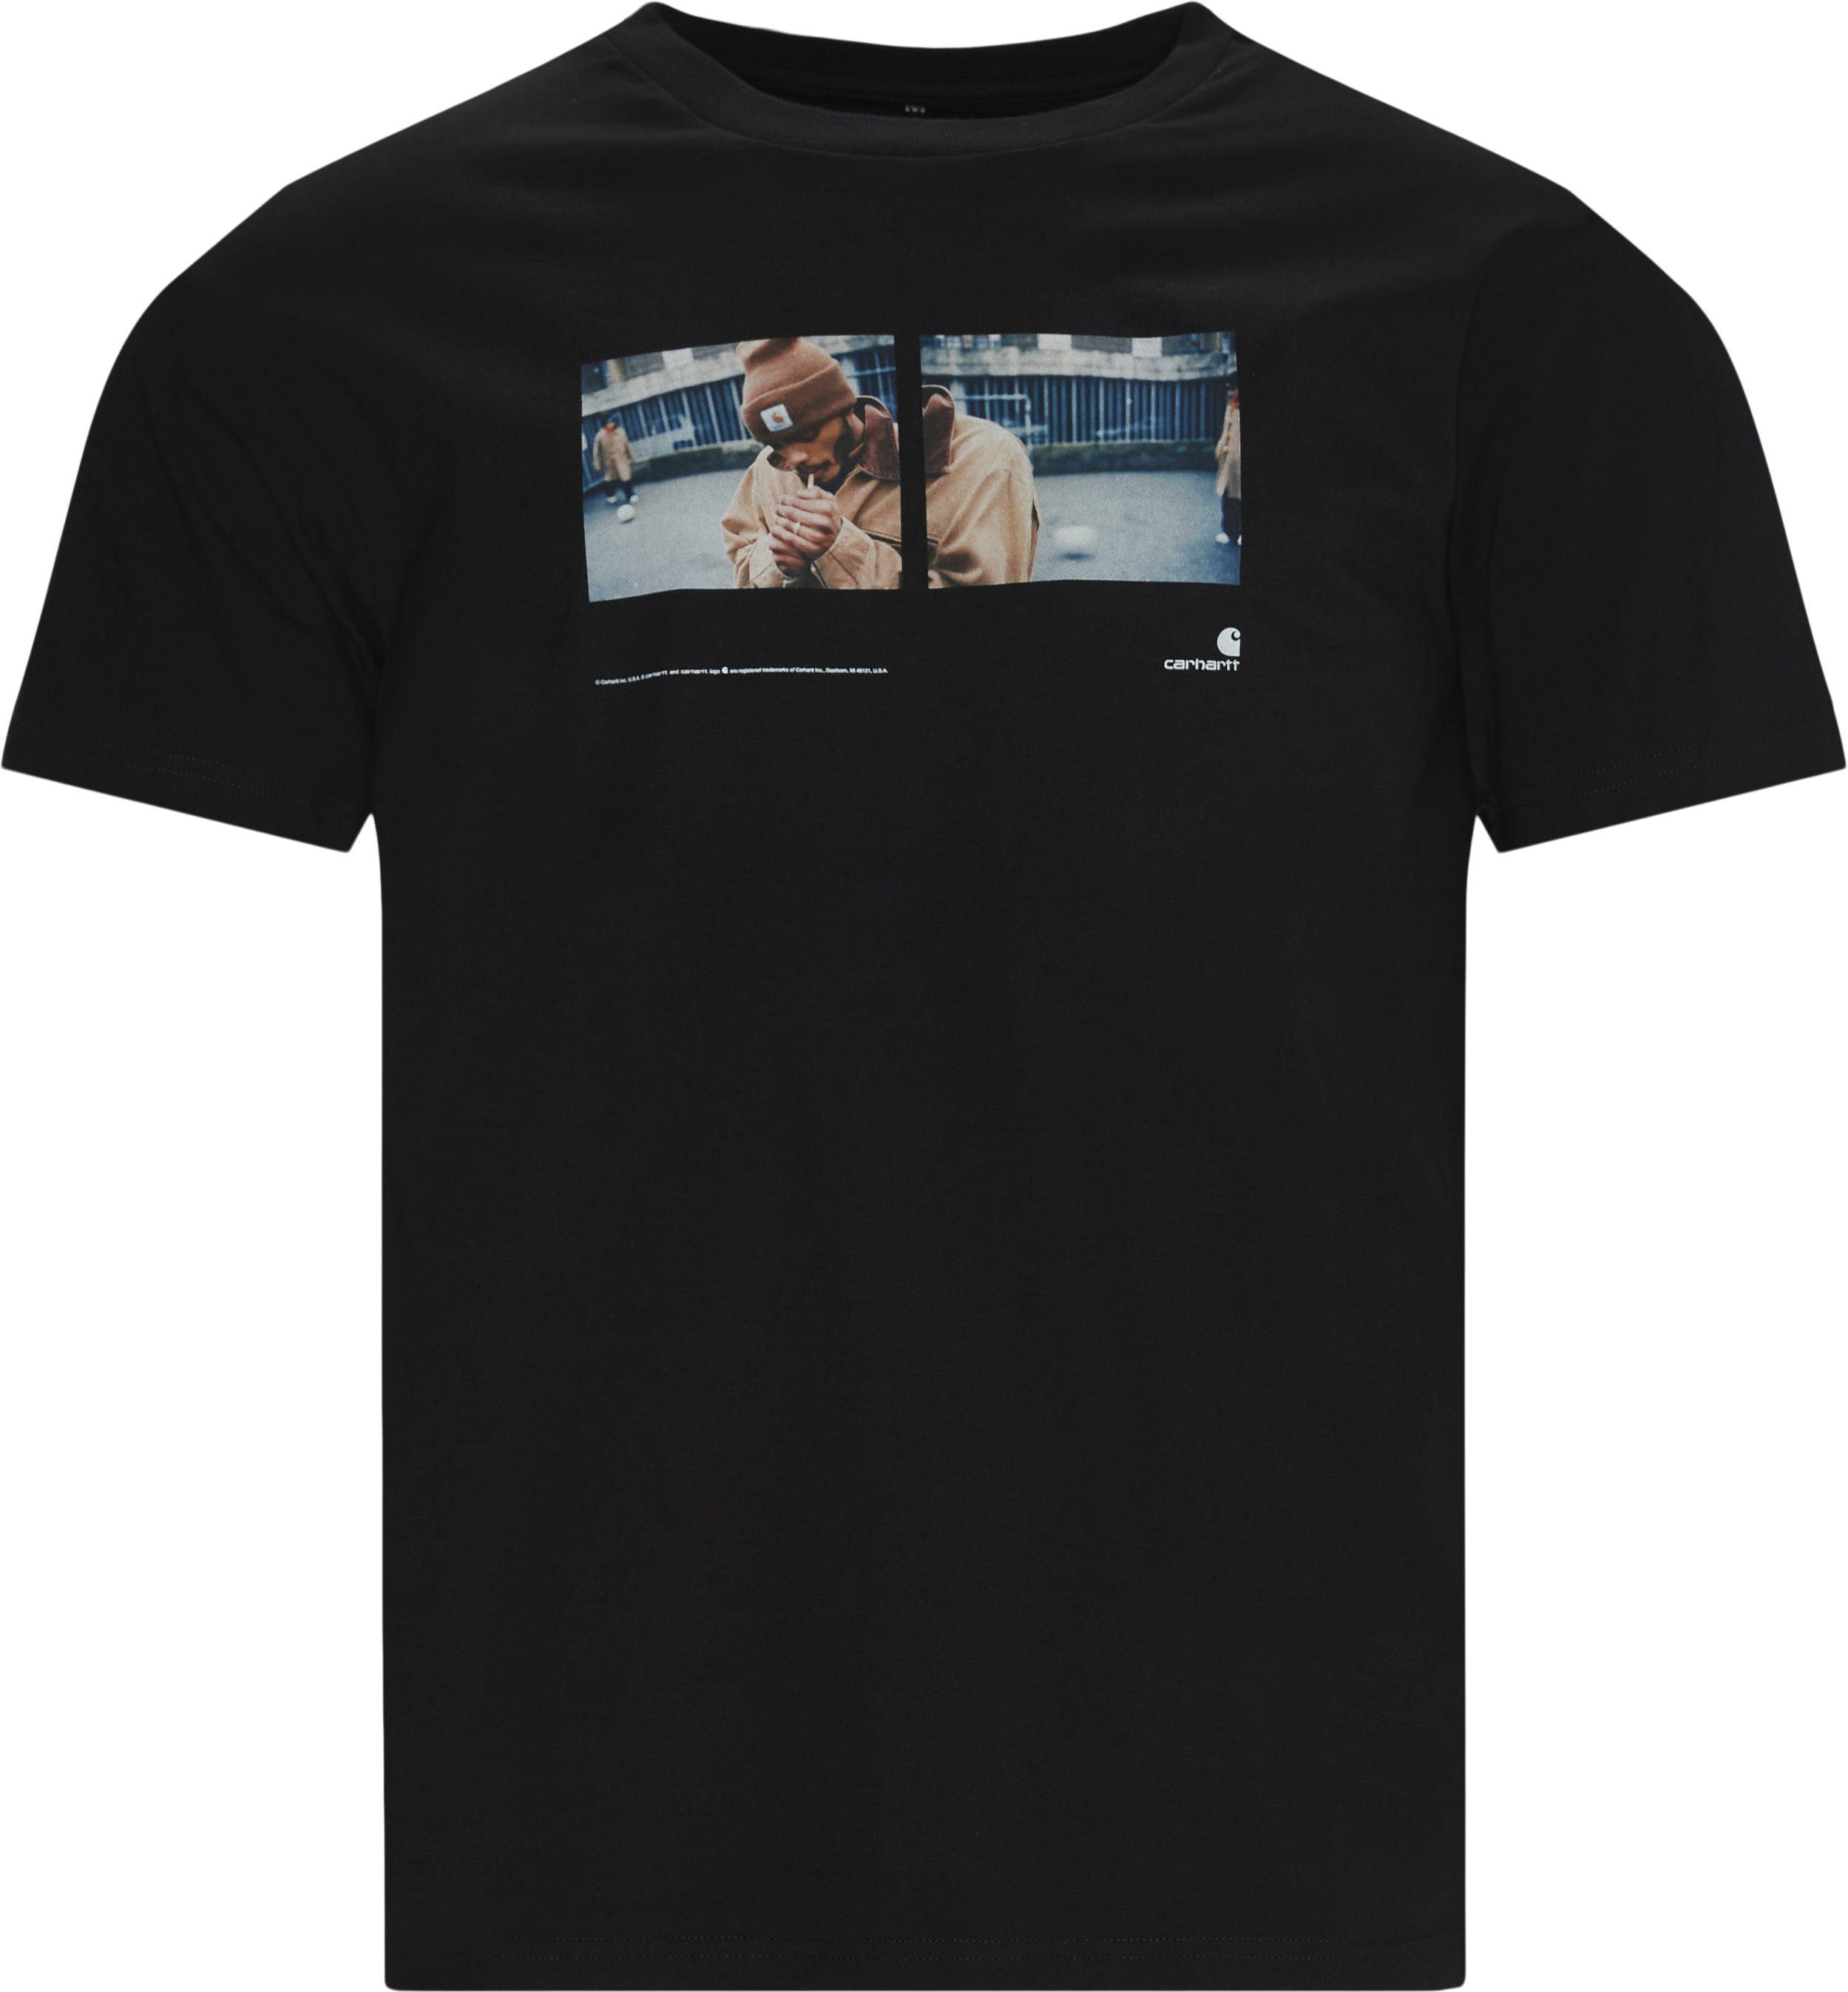 Backyard Tee - T-shirts - Regular fit - Sort